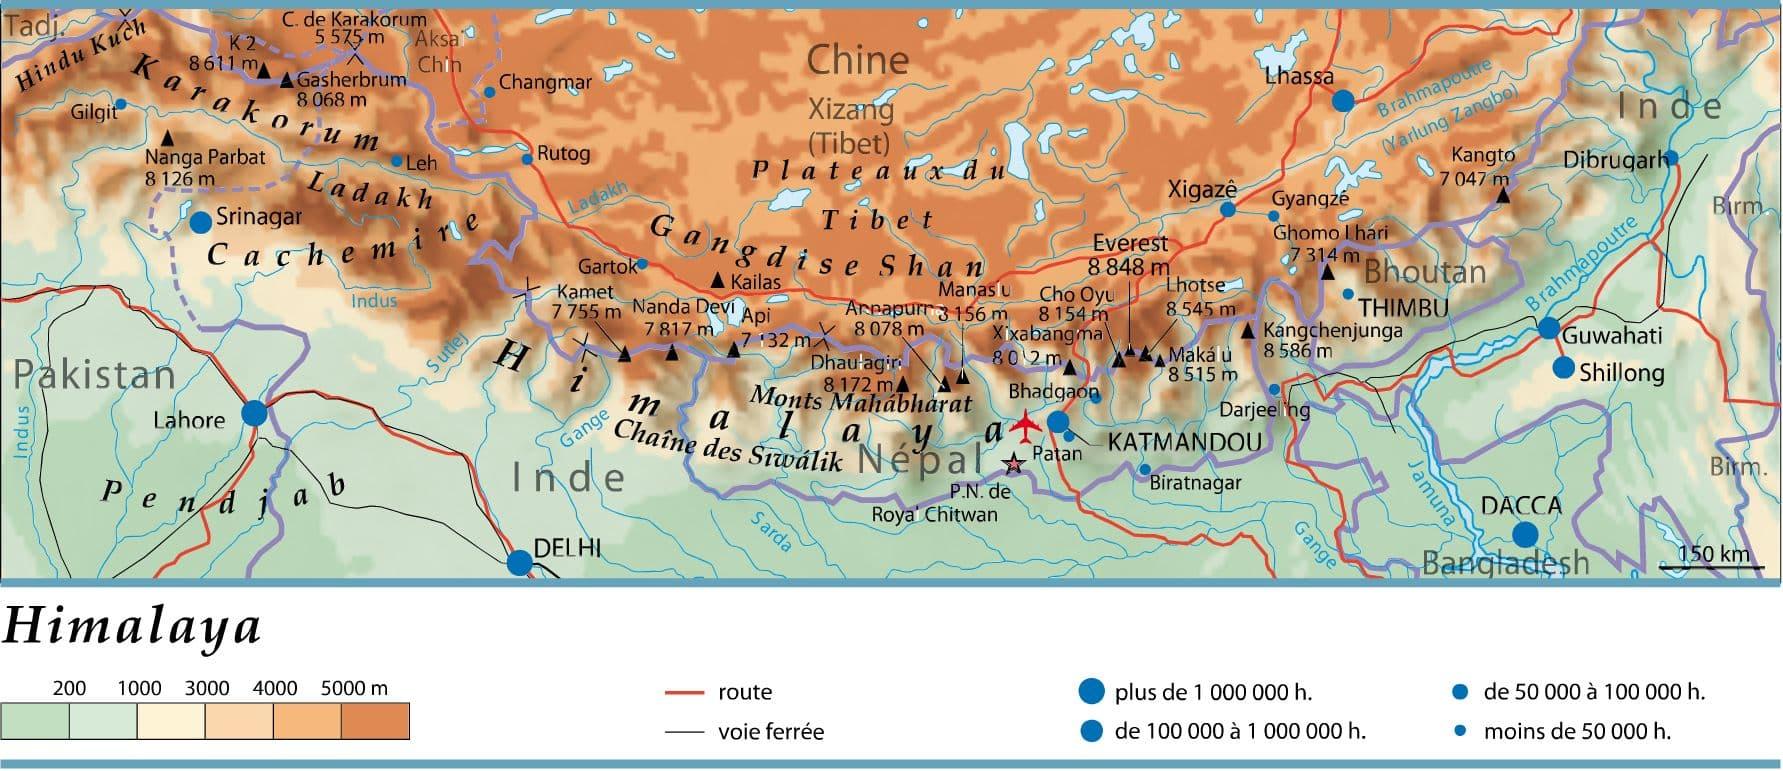 Connu Encyclopédie Larousse en ligne - Himalaya ES51